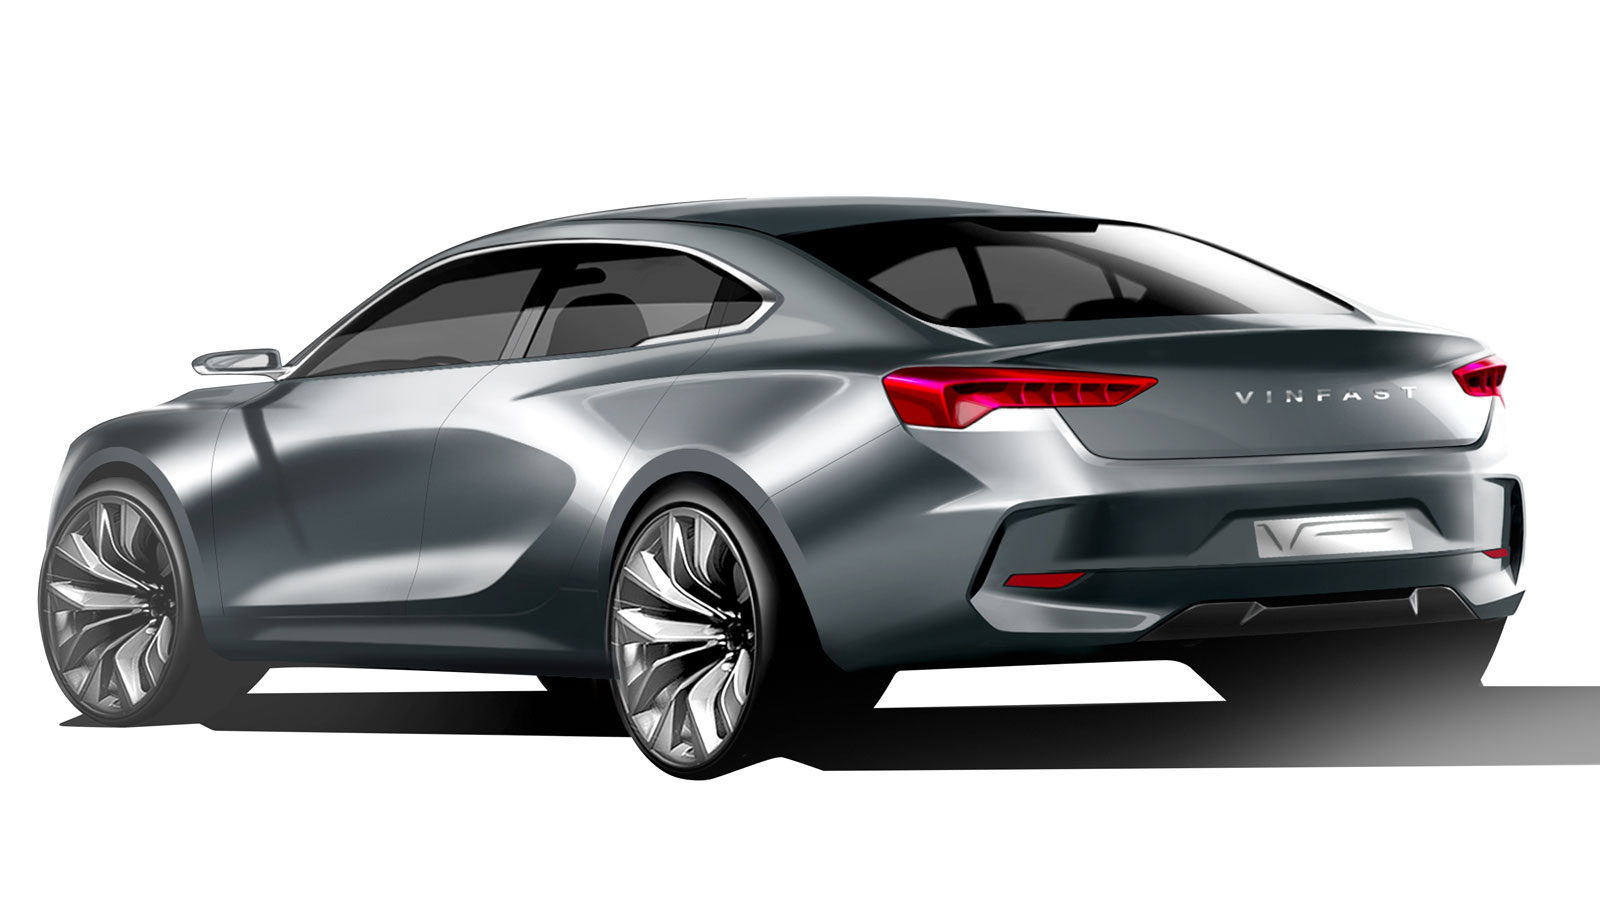 Vinfast Sedan Design Render by Italdesign - Car Body Design